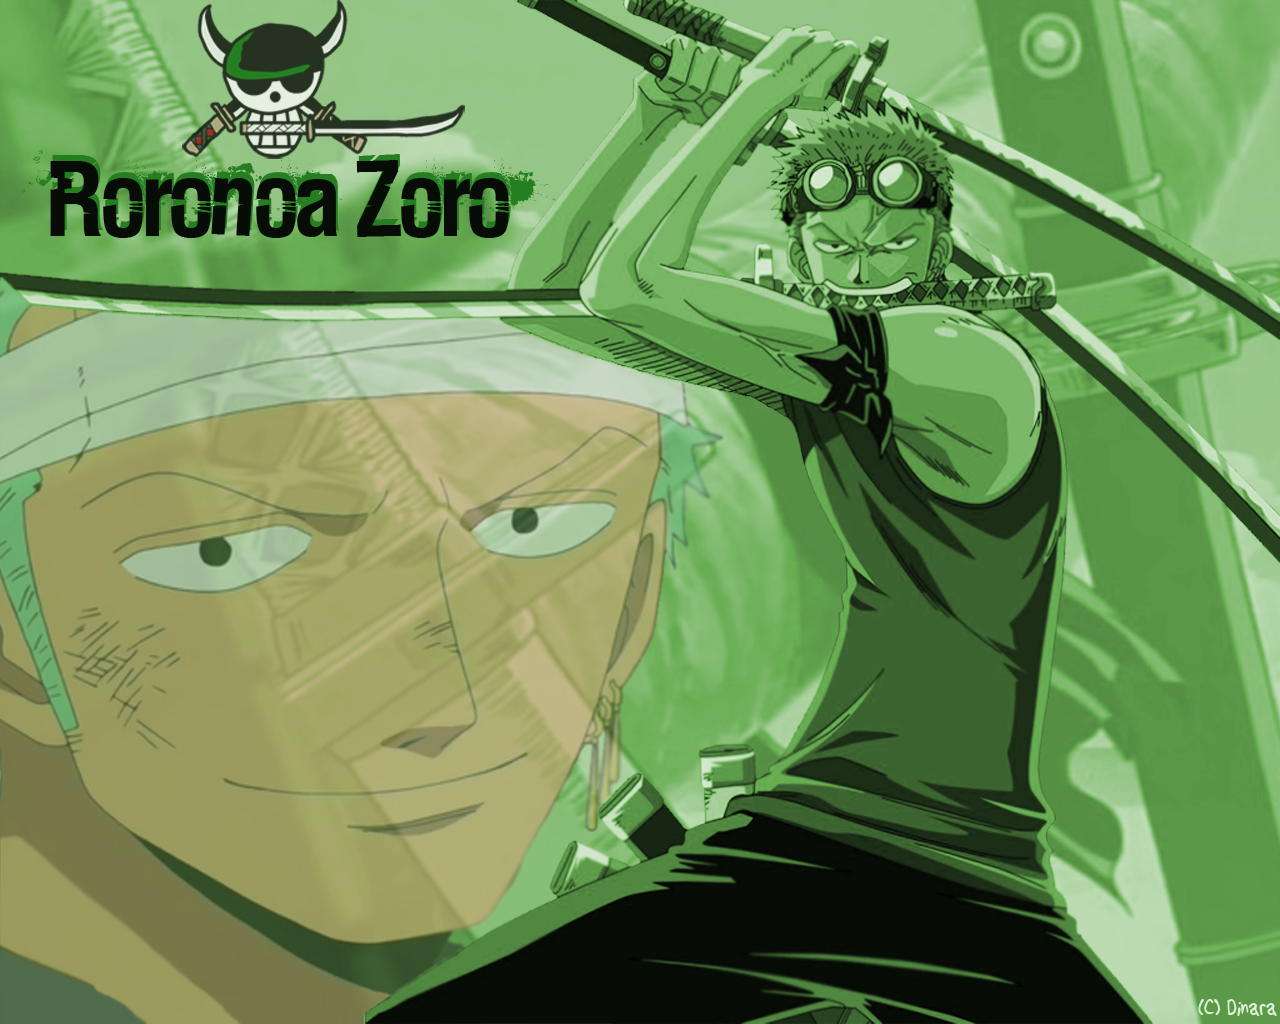 hình nền máy tinh Zoro onepiece